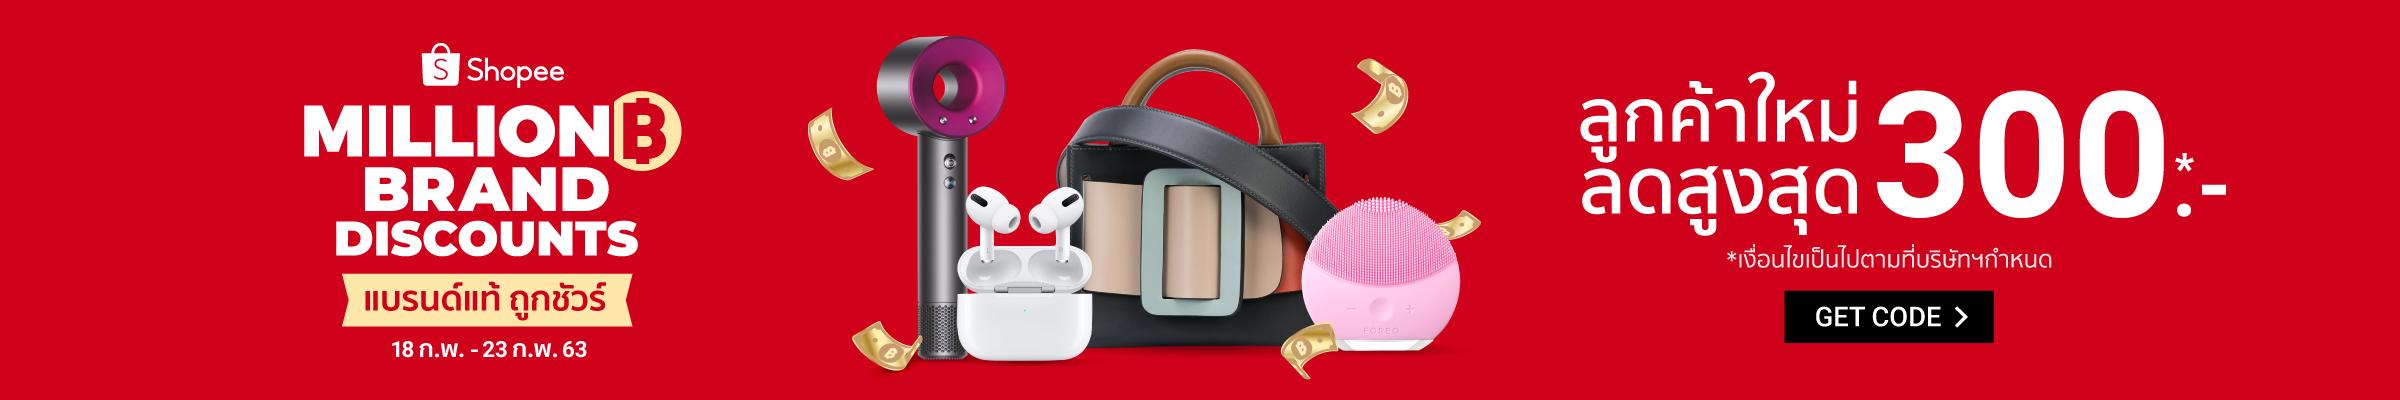 Shopee Million Brand Discounts Campaign